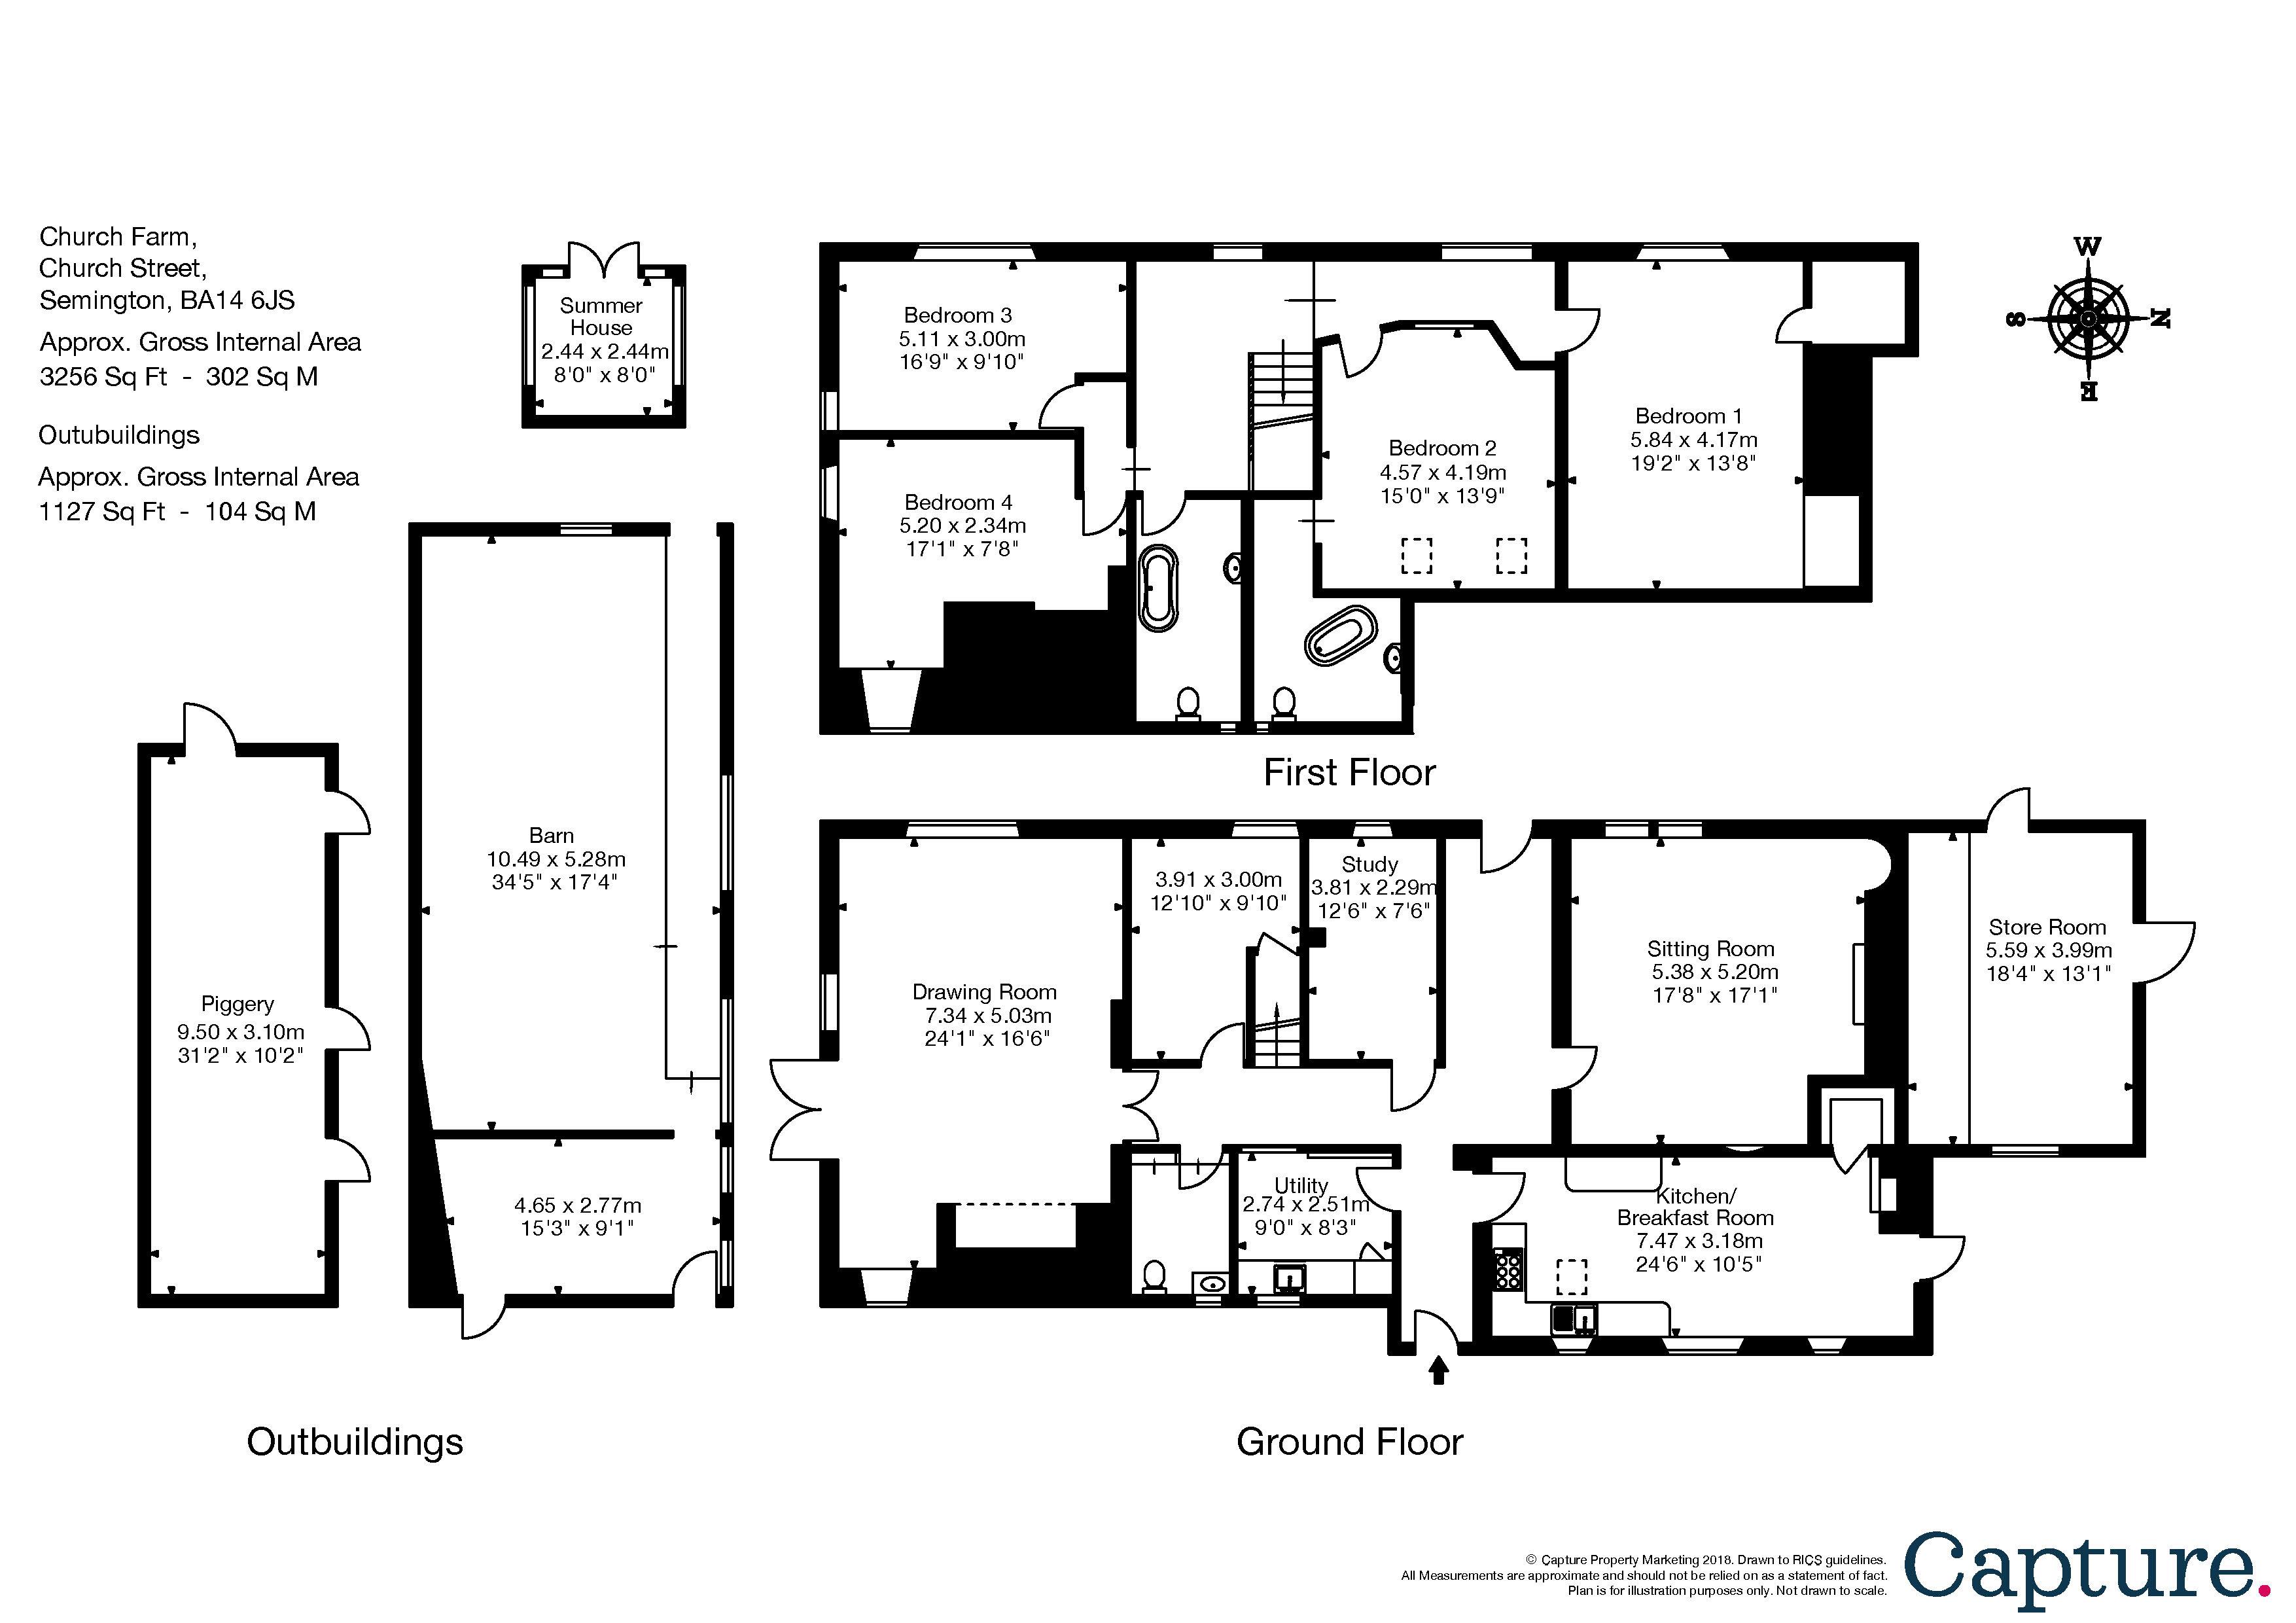 4 Bedroom Property For Sale In Church Street Semington